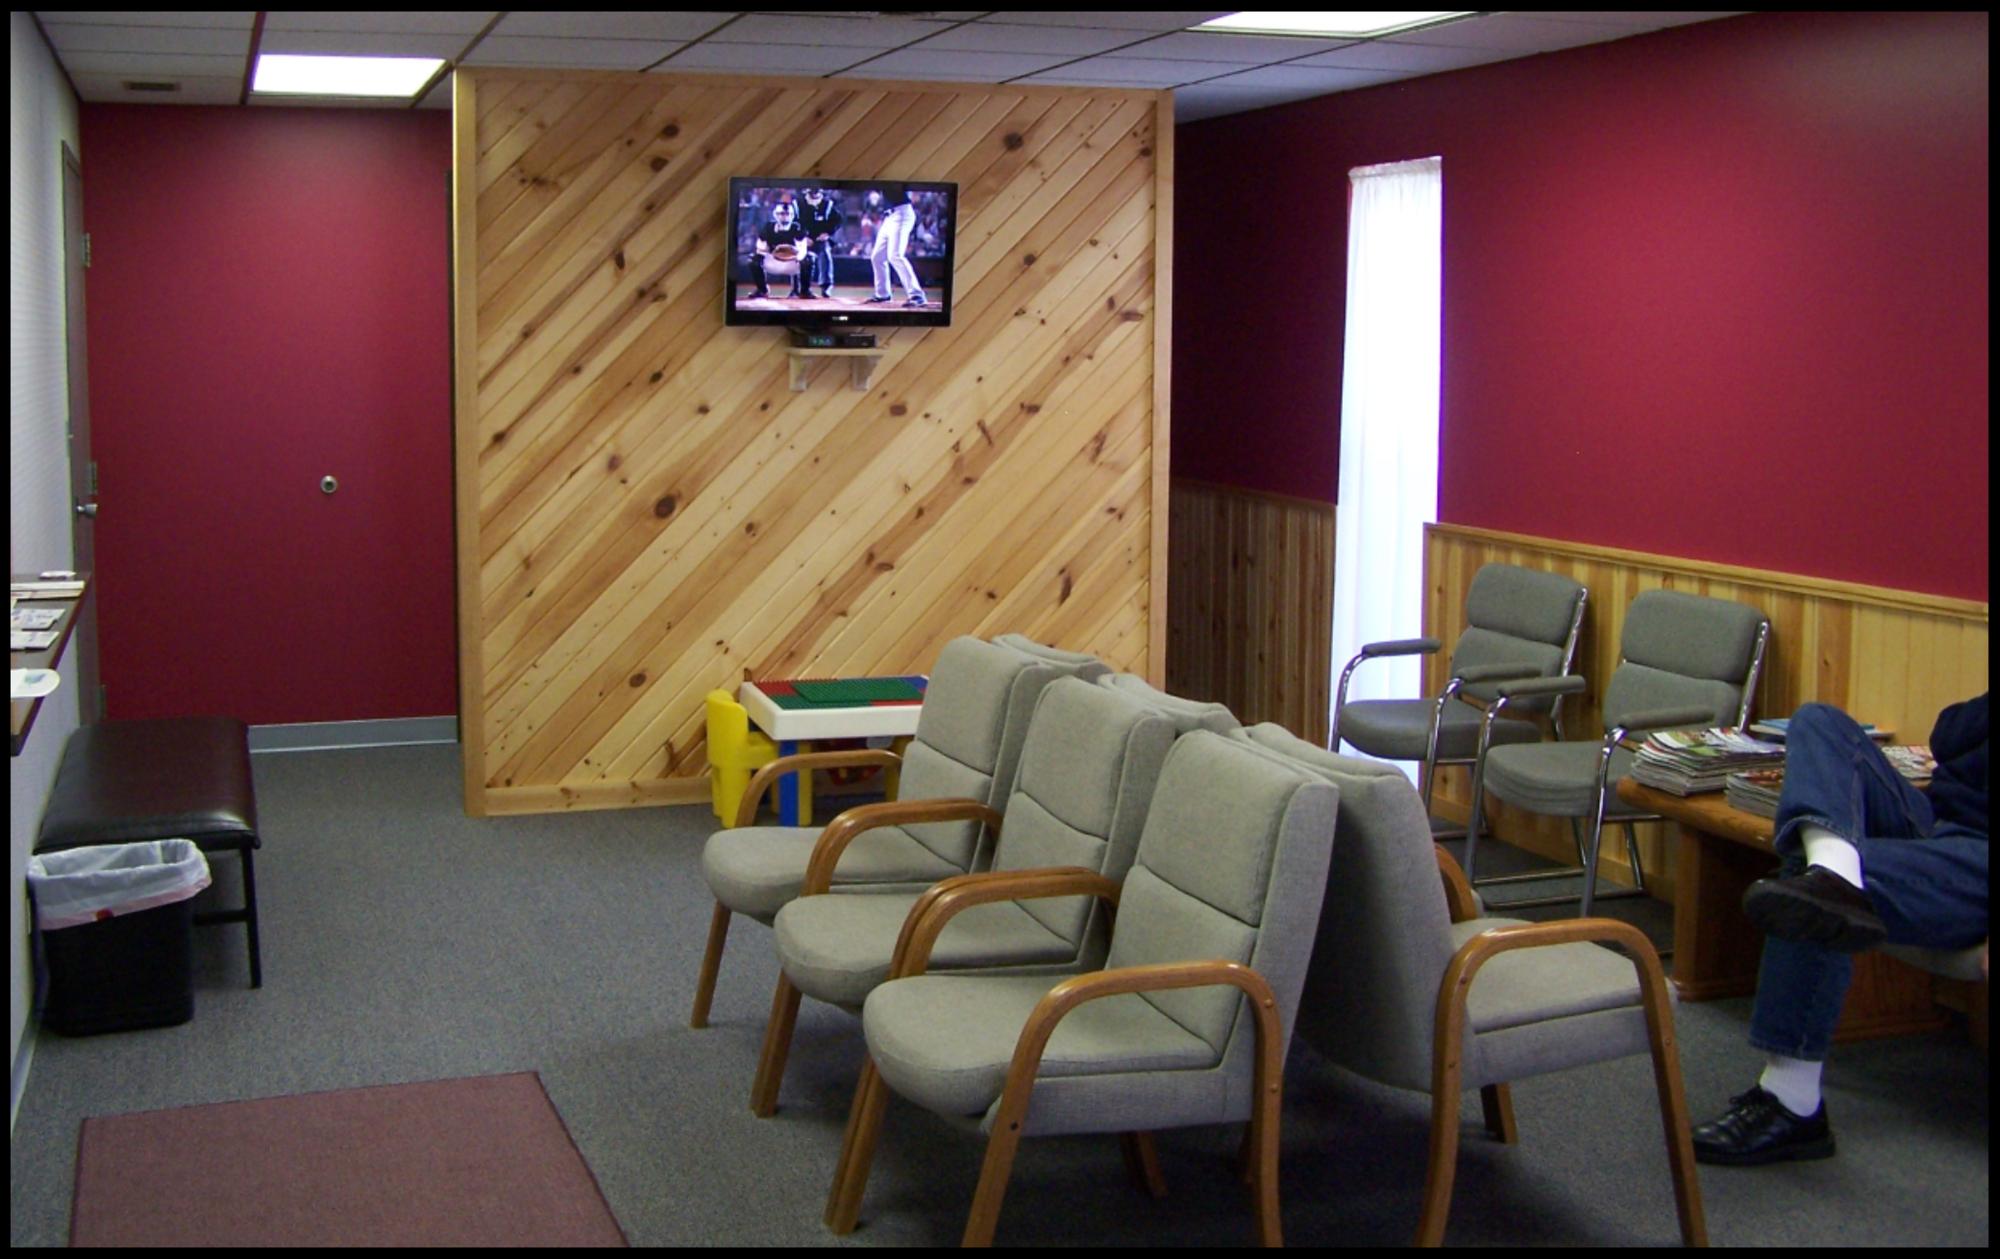 Cermak Office Center